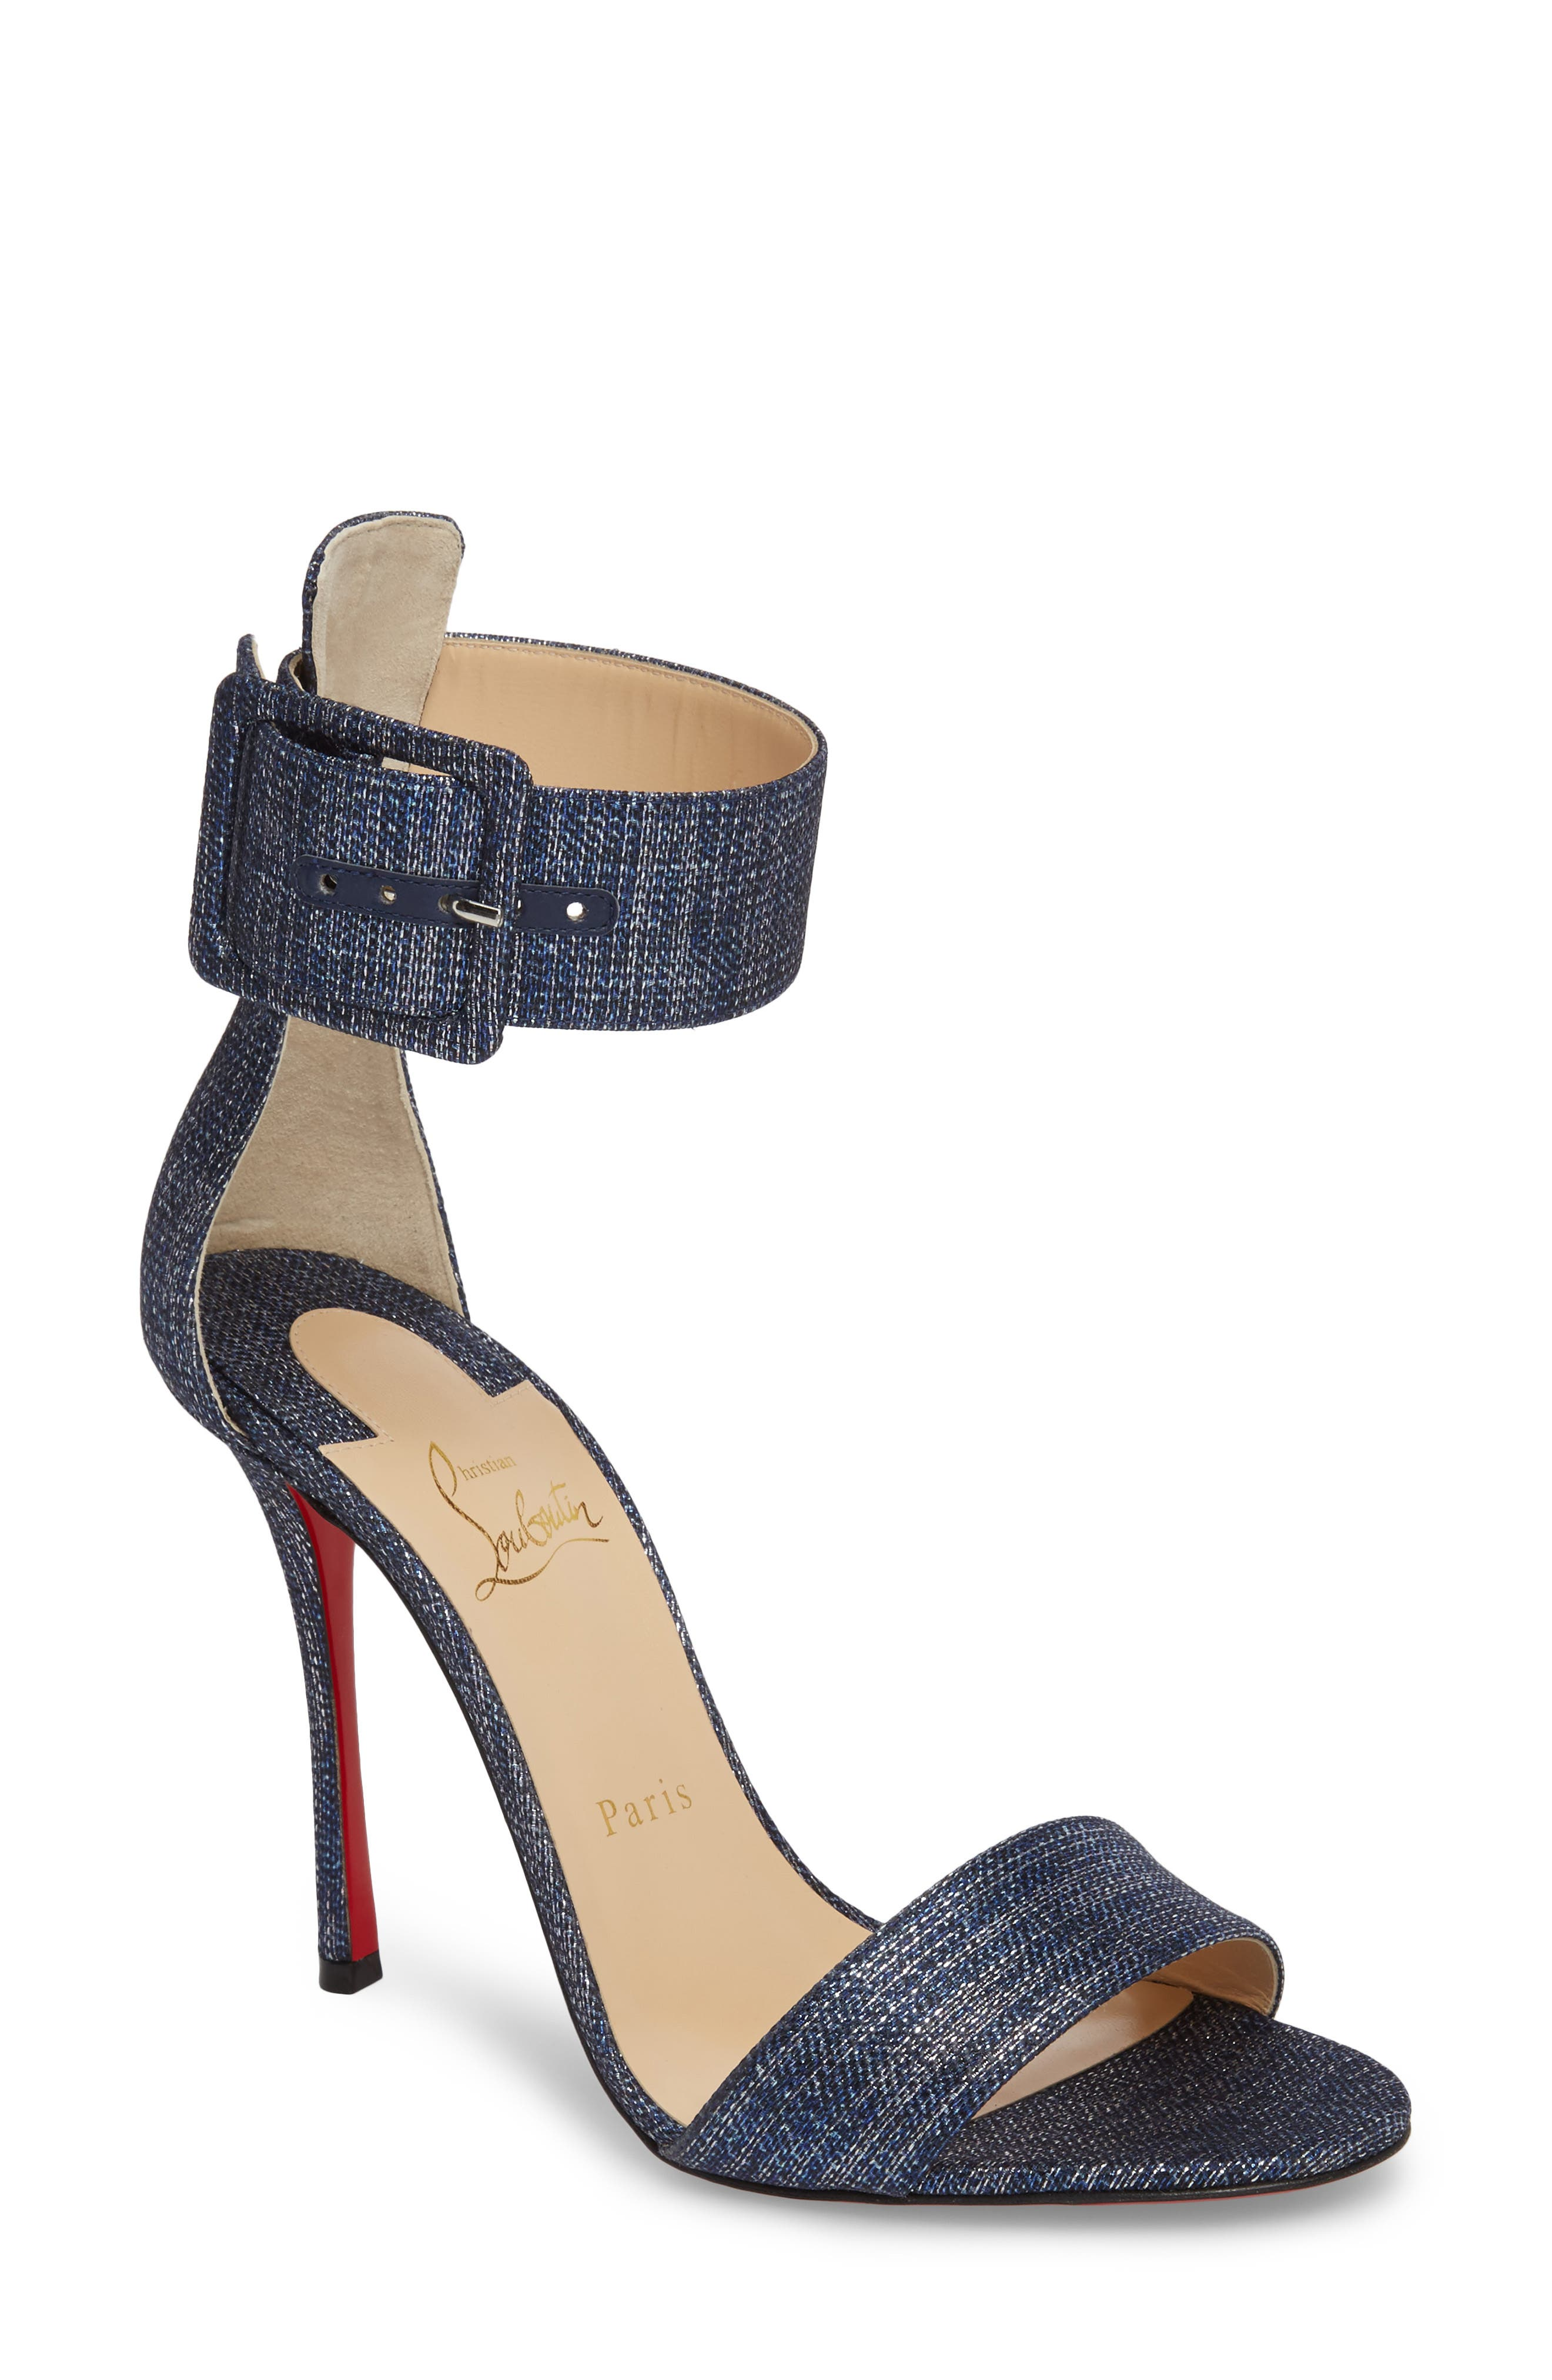 Christian Louboutin Blade Runana Cuffed Sandal (Women)